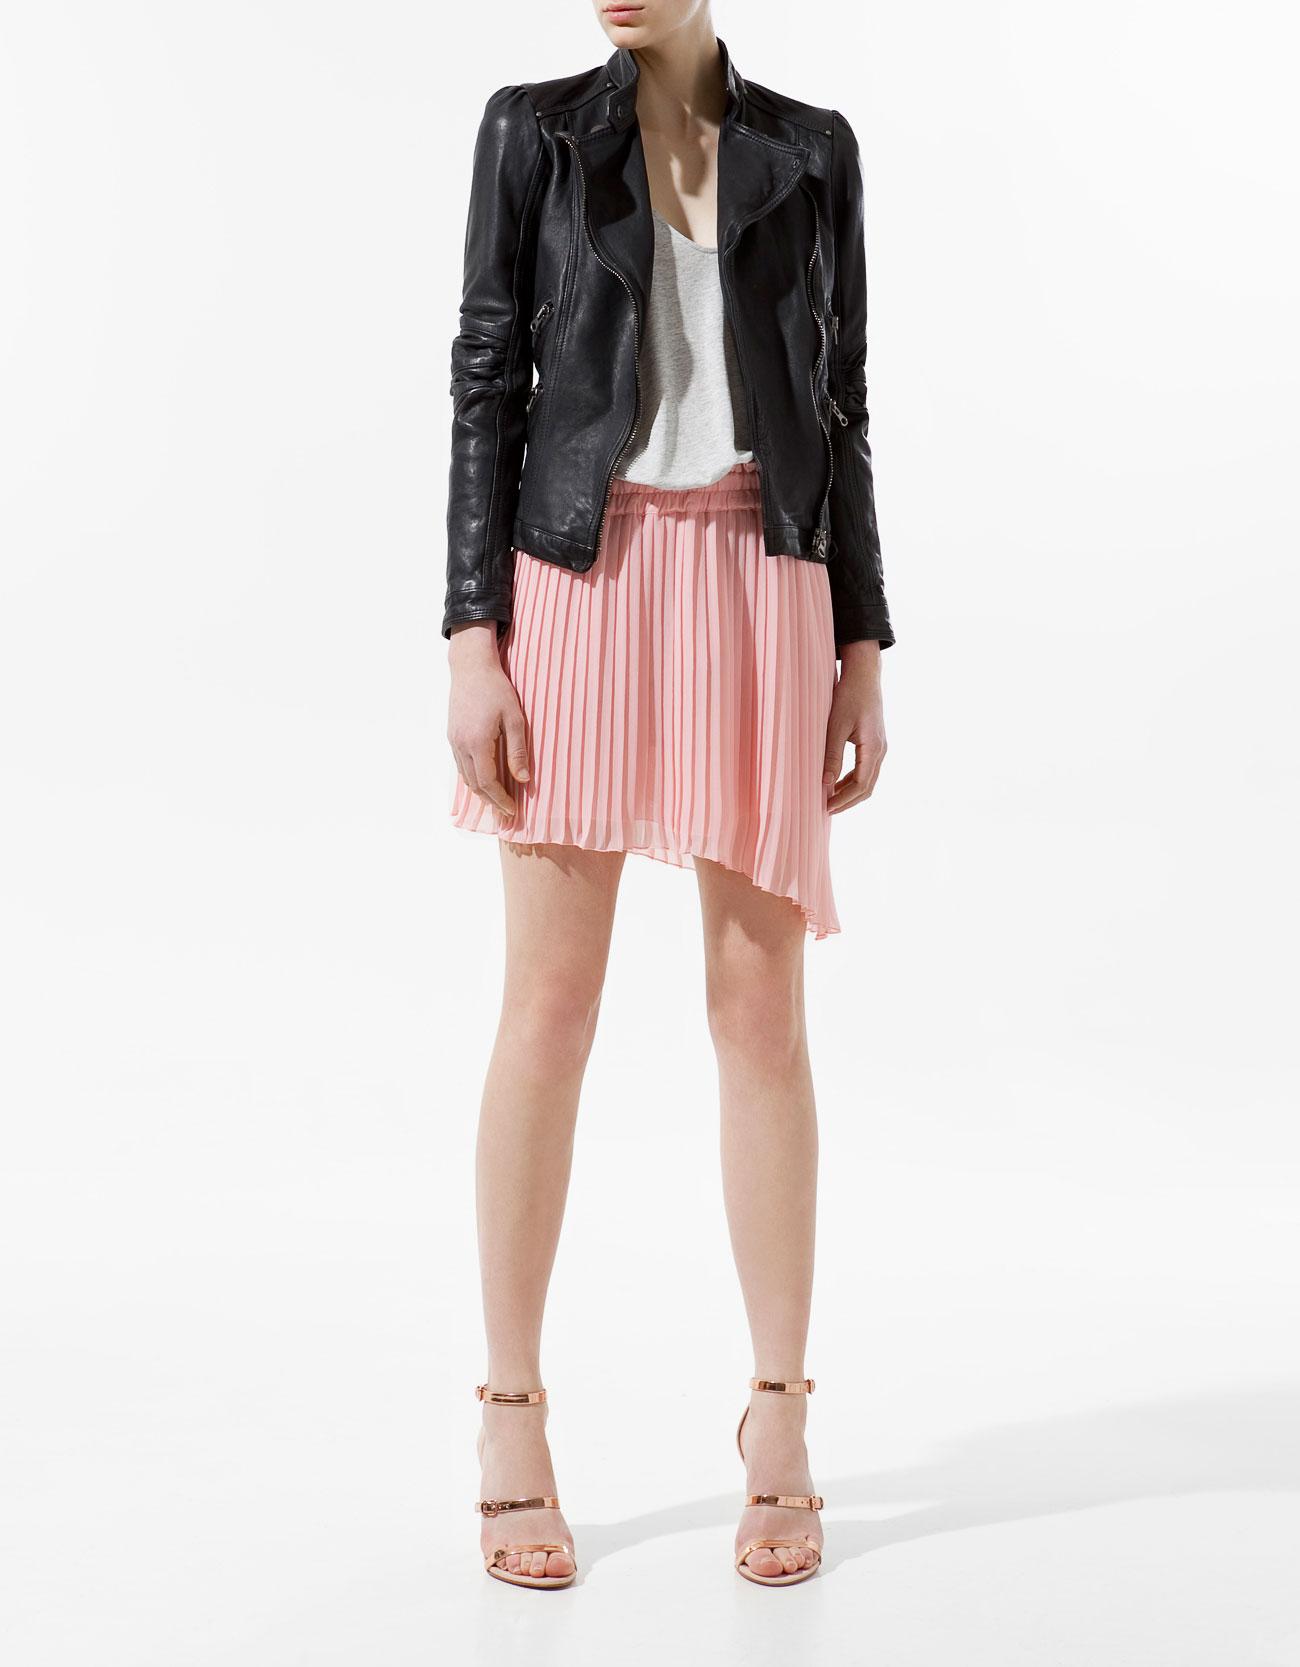 Zara Leather Jacket 20